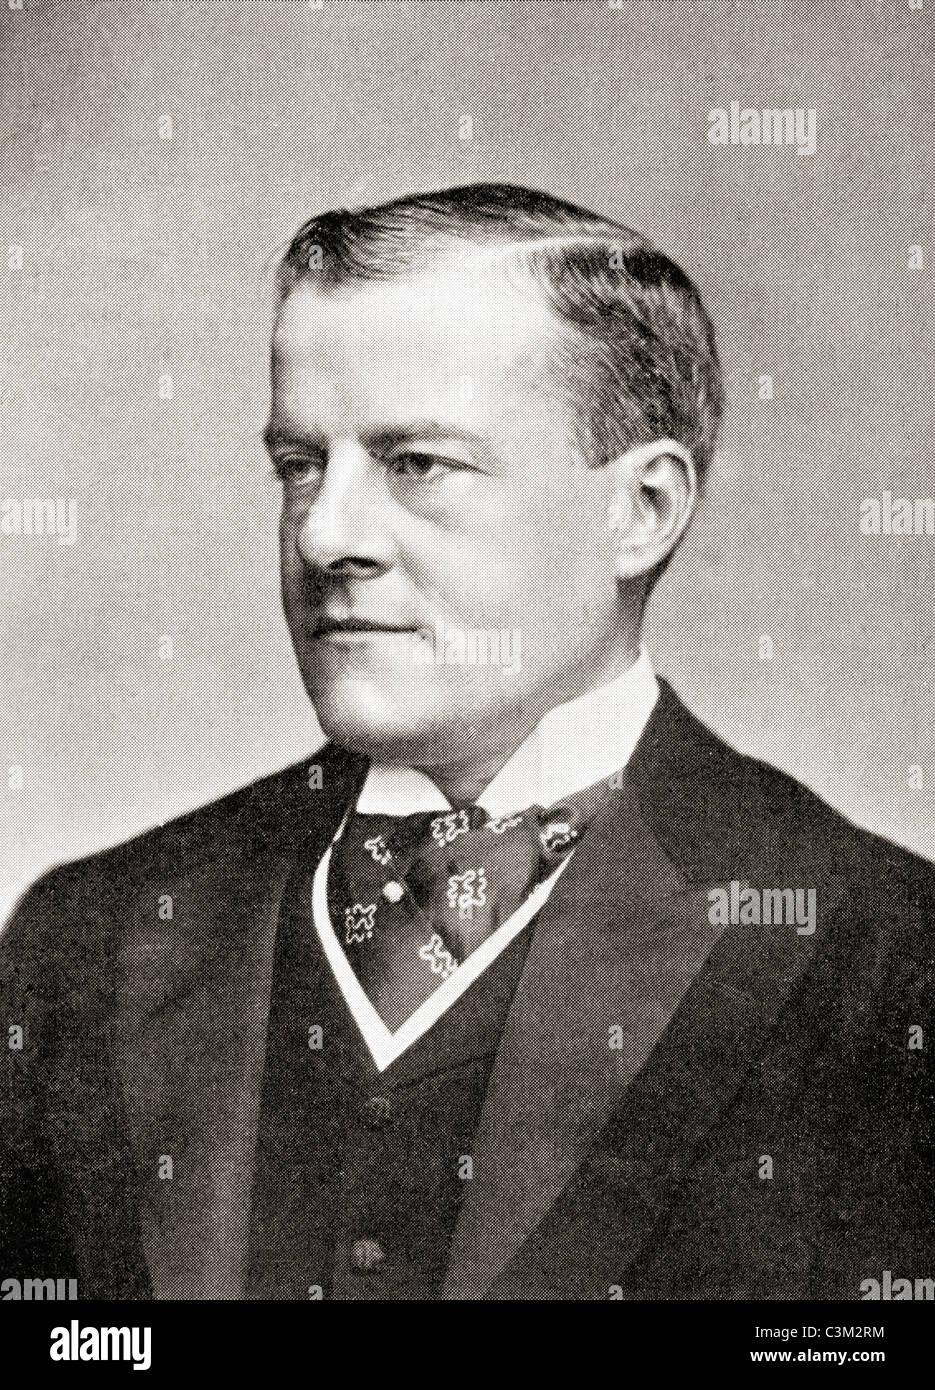 Sir John Grant Lawson, 1st Baronet, 1856 – 1919. British Unionist politician. - Stock Image